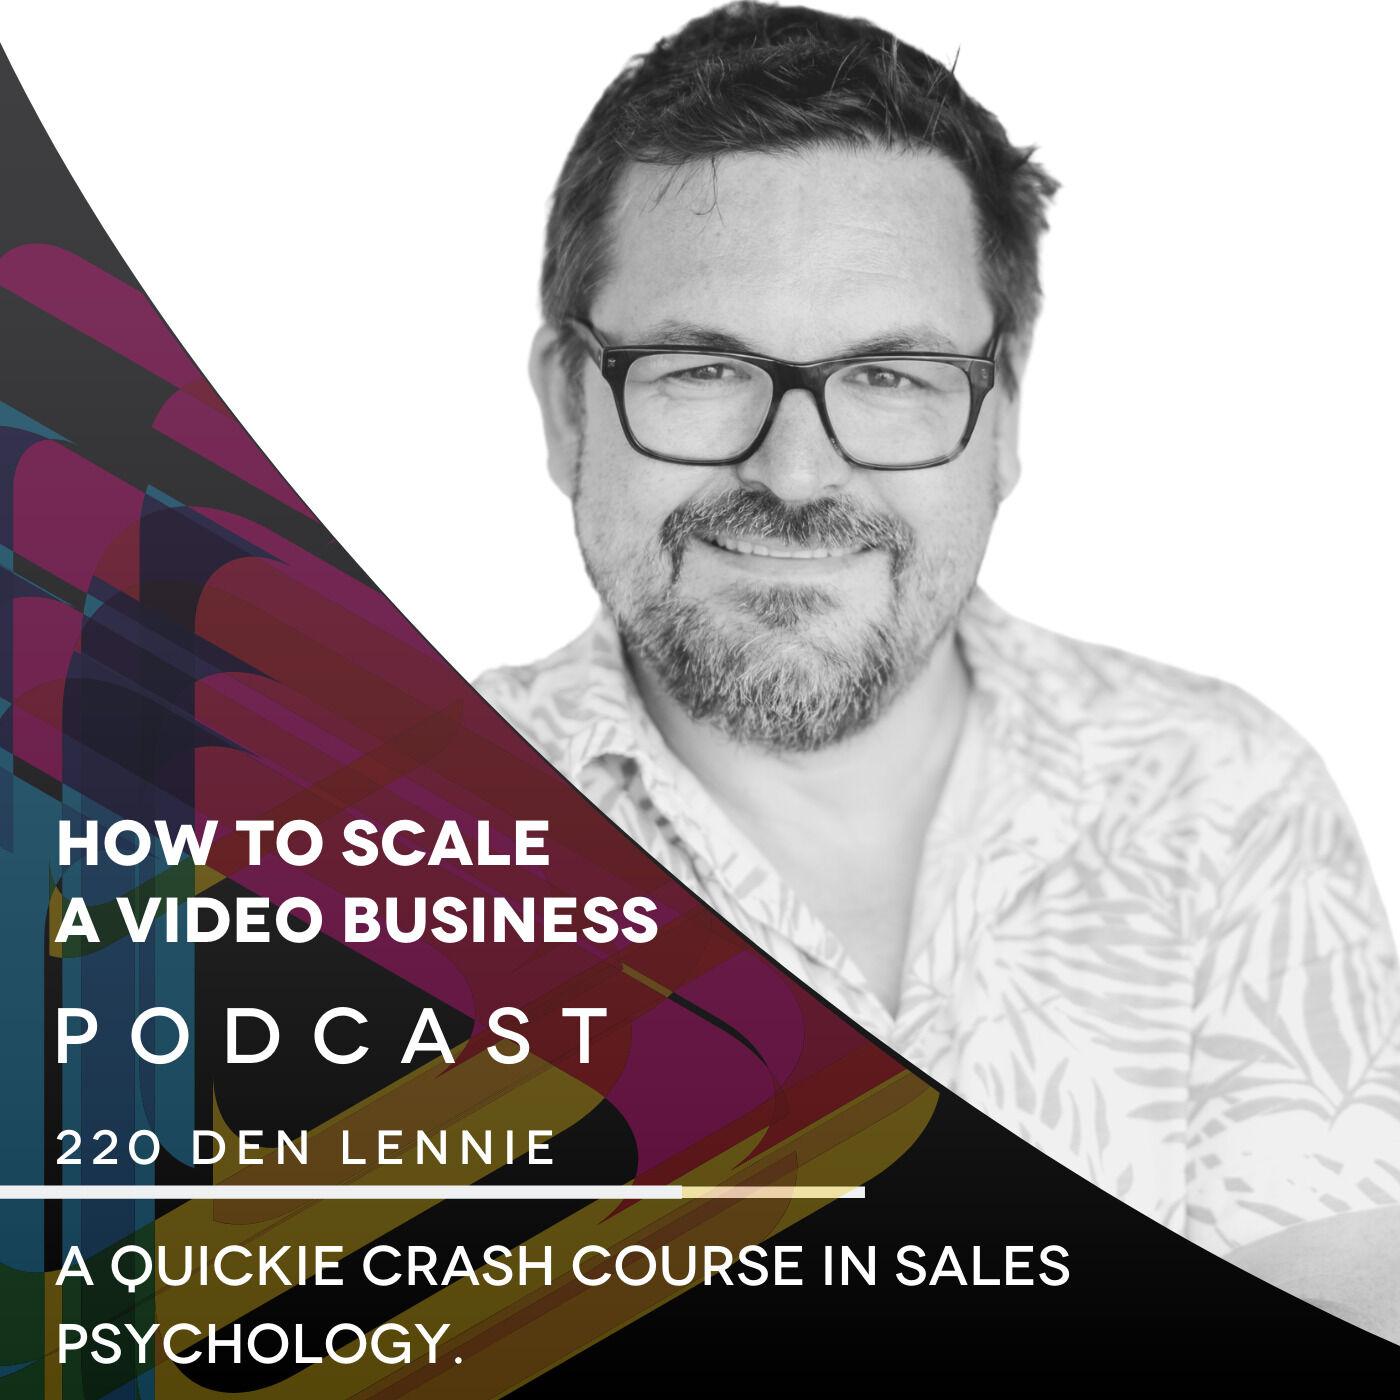 A quickie crash course in sales psychology. EP #220 - Den Lennie